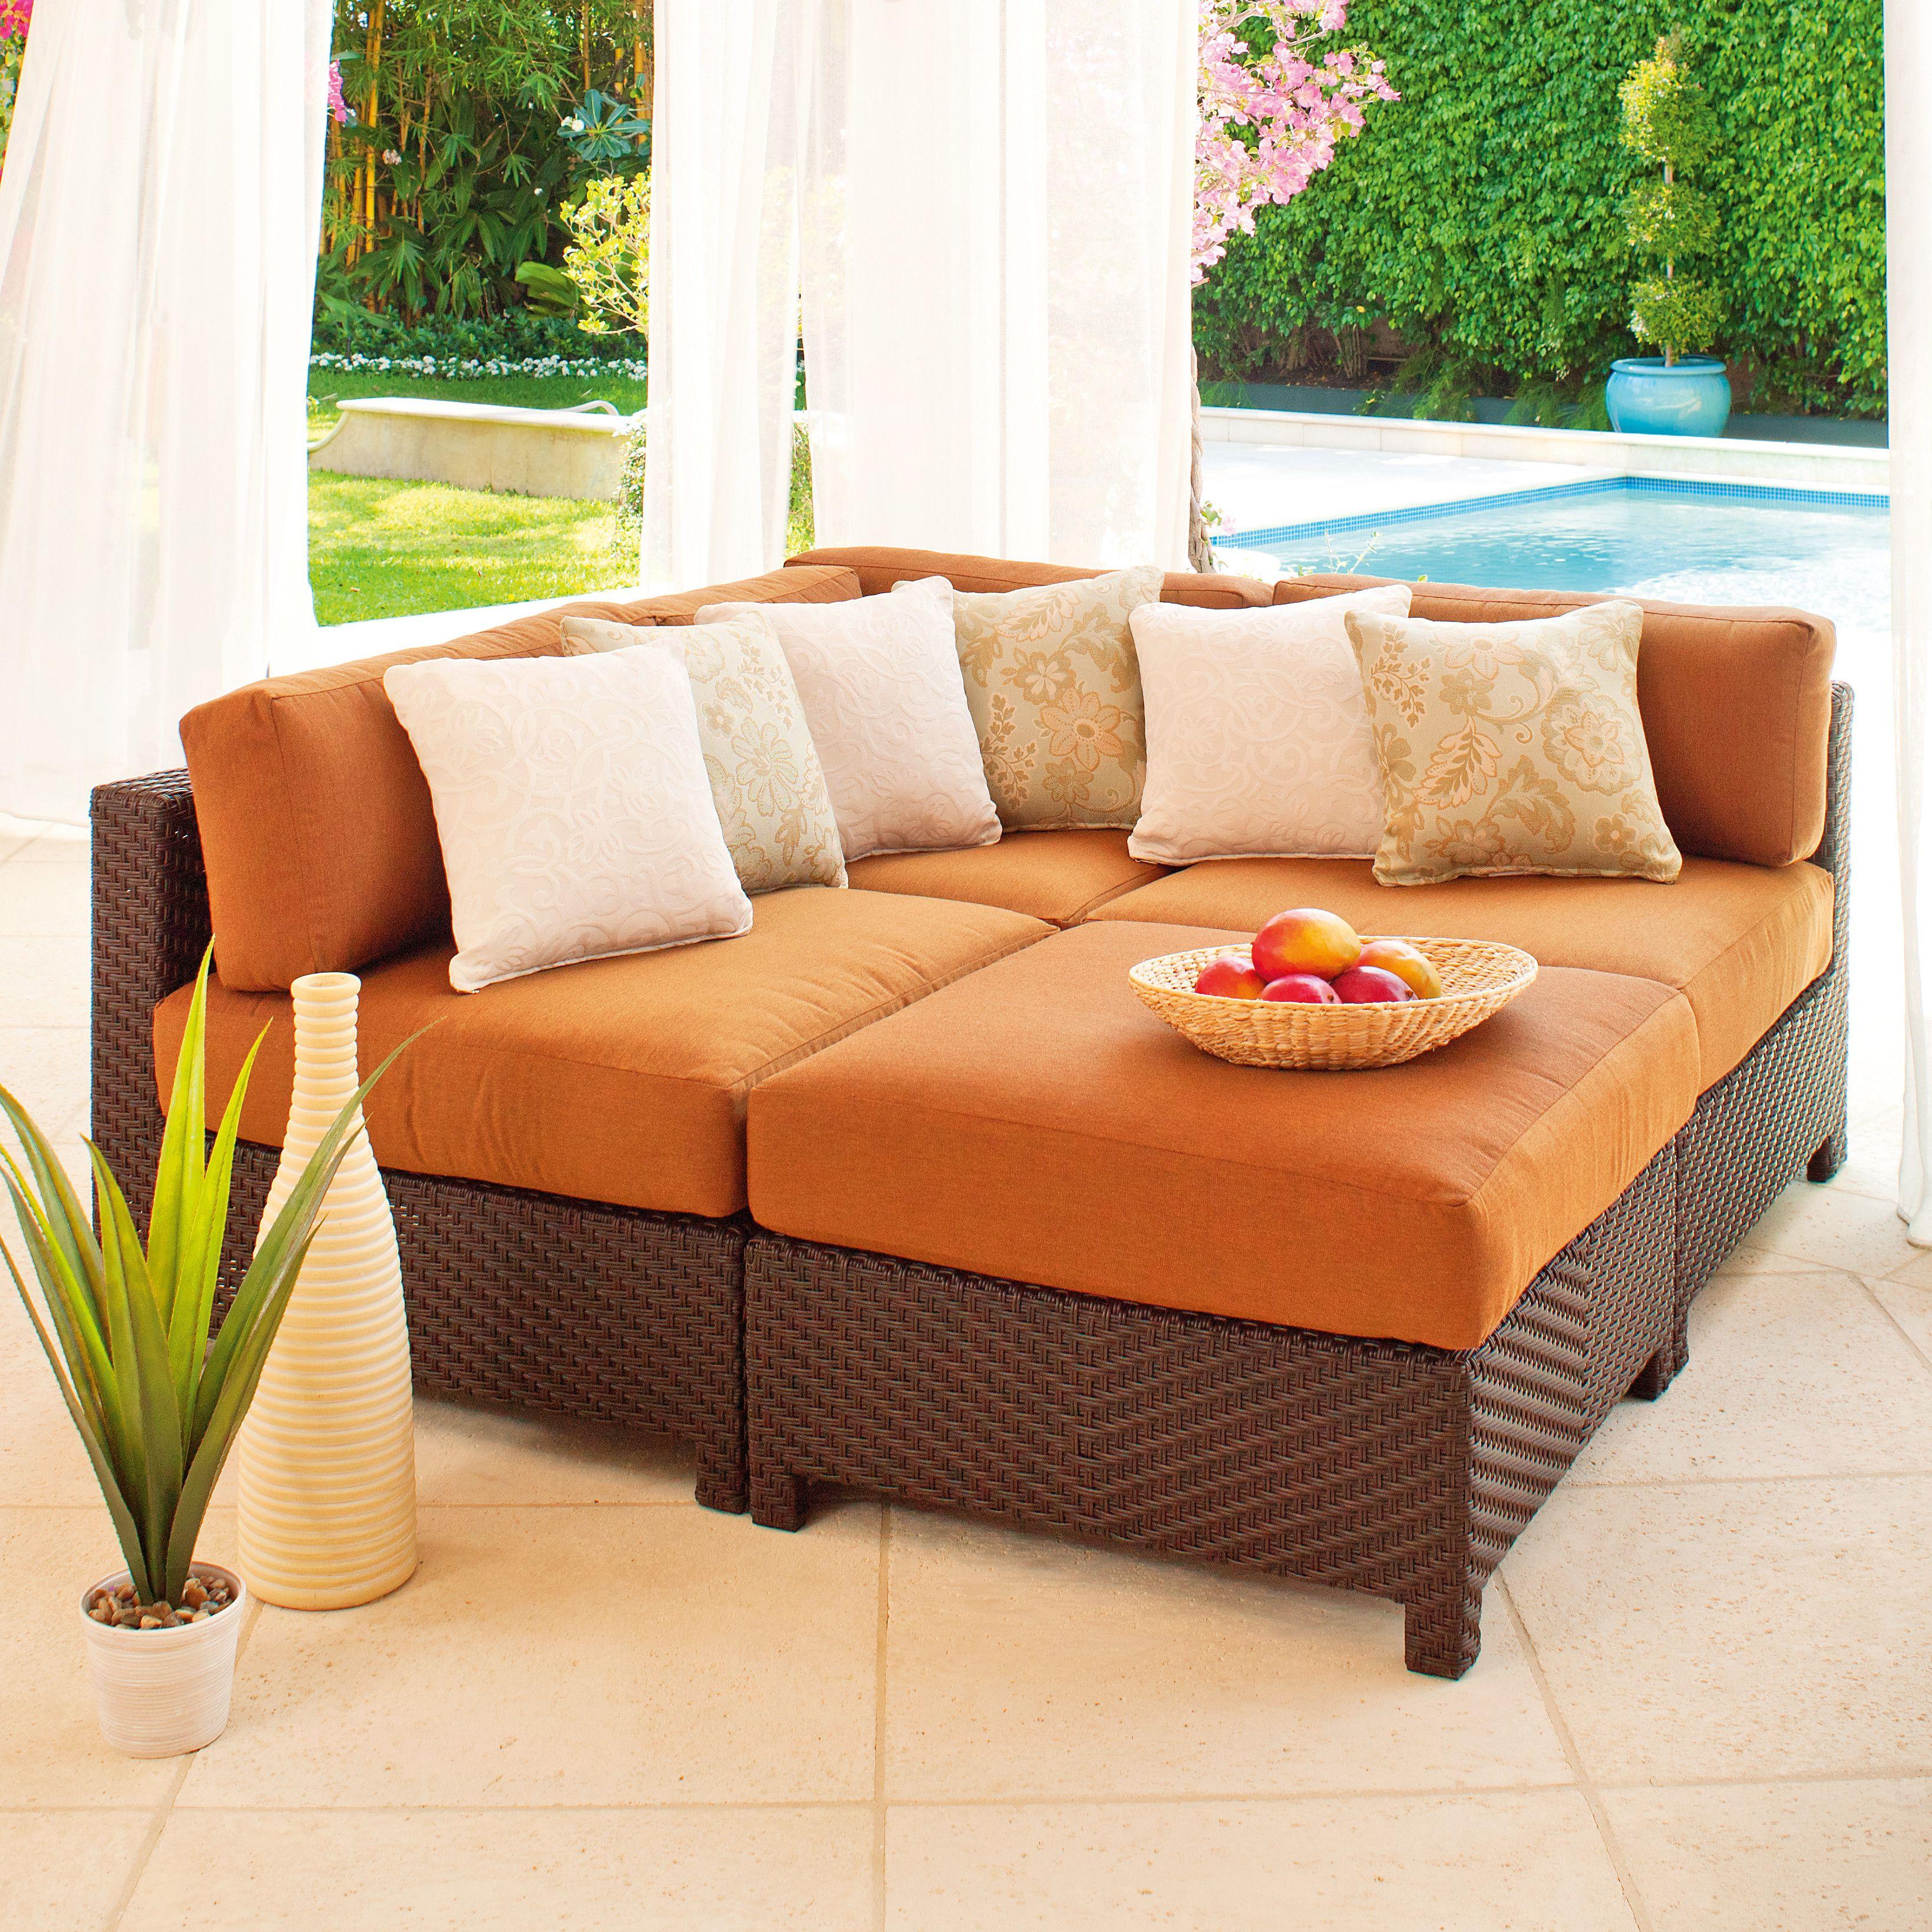 Great Extra Deep Seat Sofa 52 On Modern Sofa Ideas With Extra Deep Seat Sofa